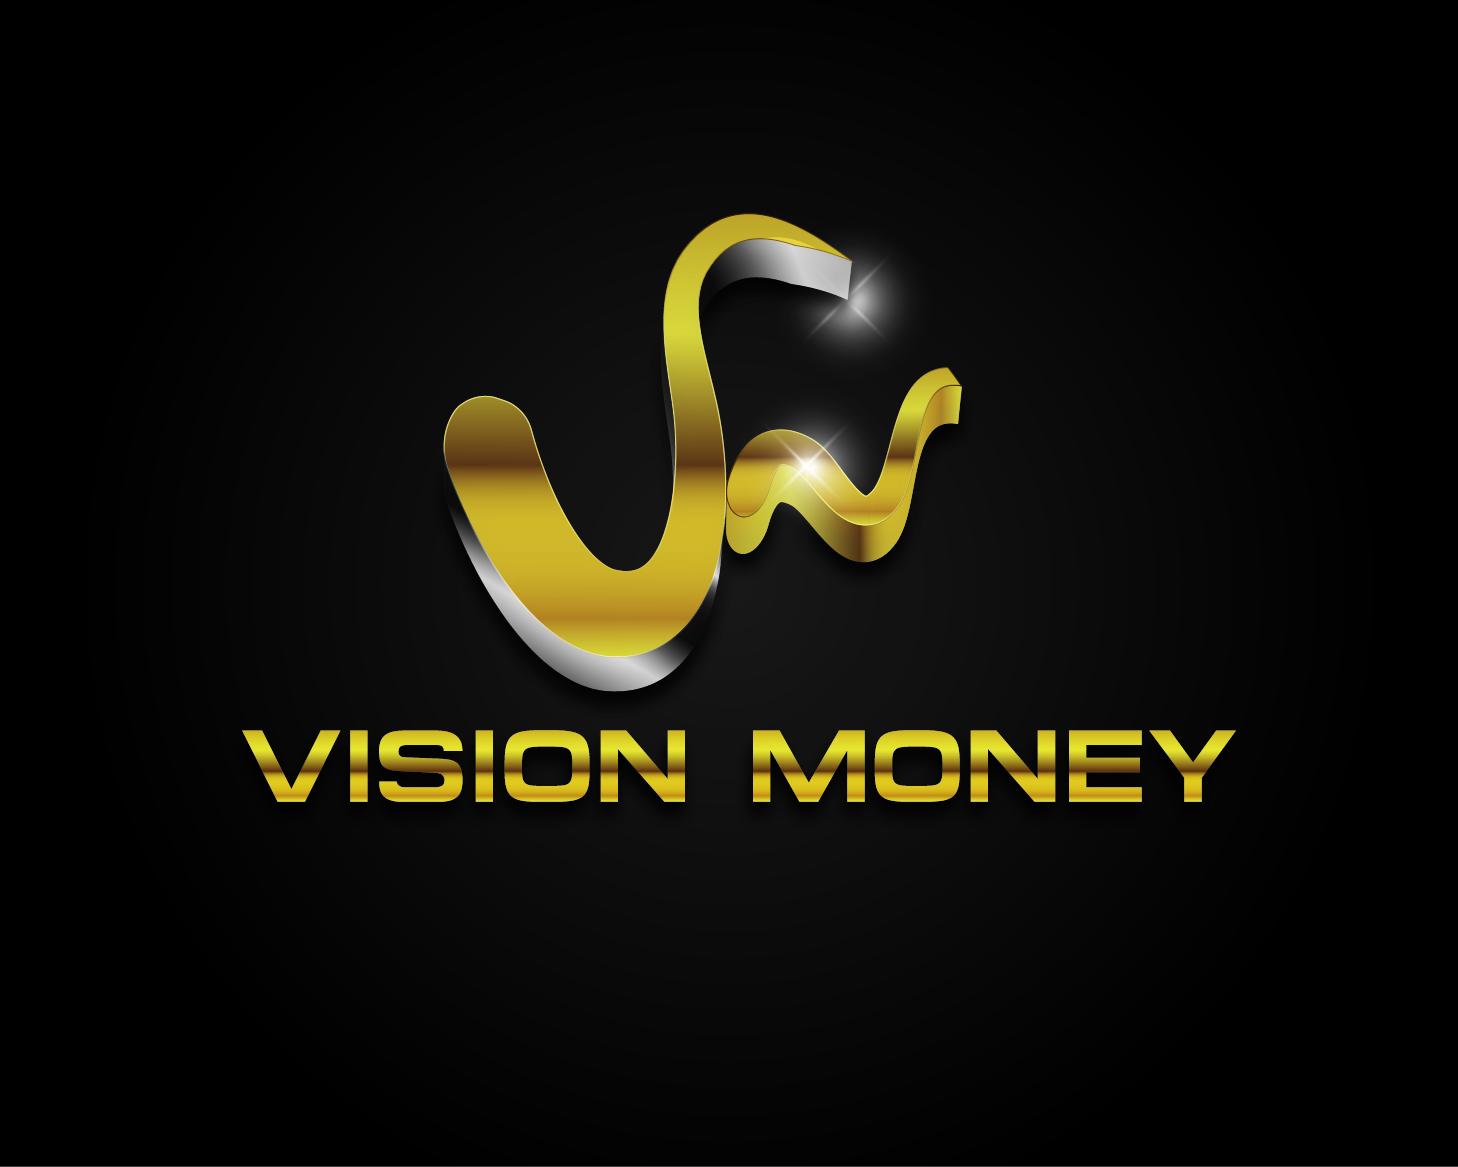 Logo Design by VENTSISLAV KOVACHEV - Entry No. 22 in the Logo Design Contest Captivating Logo Design for VISION MONEY.